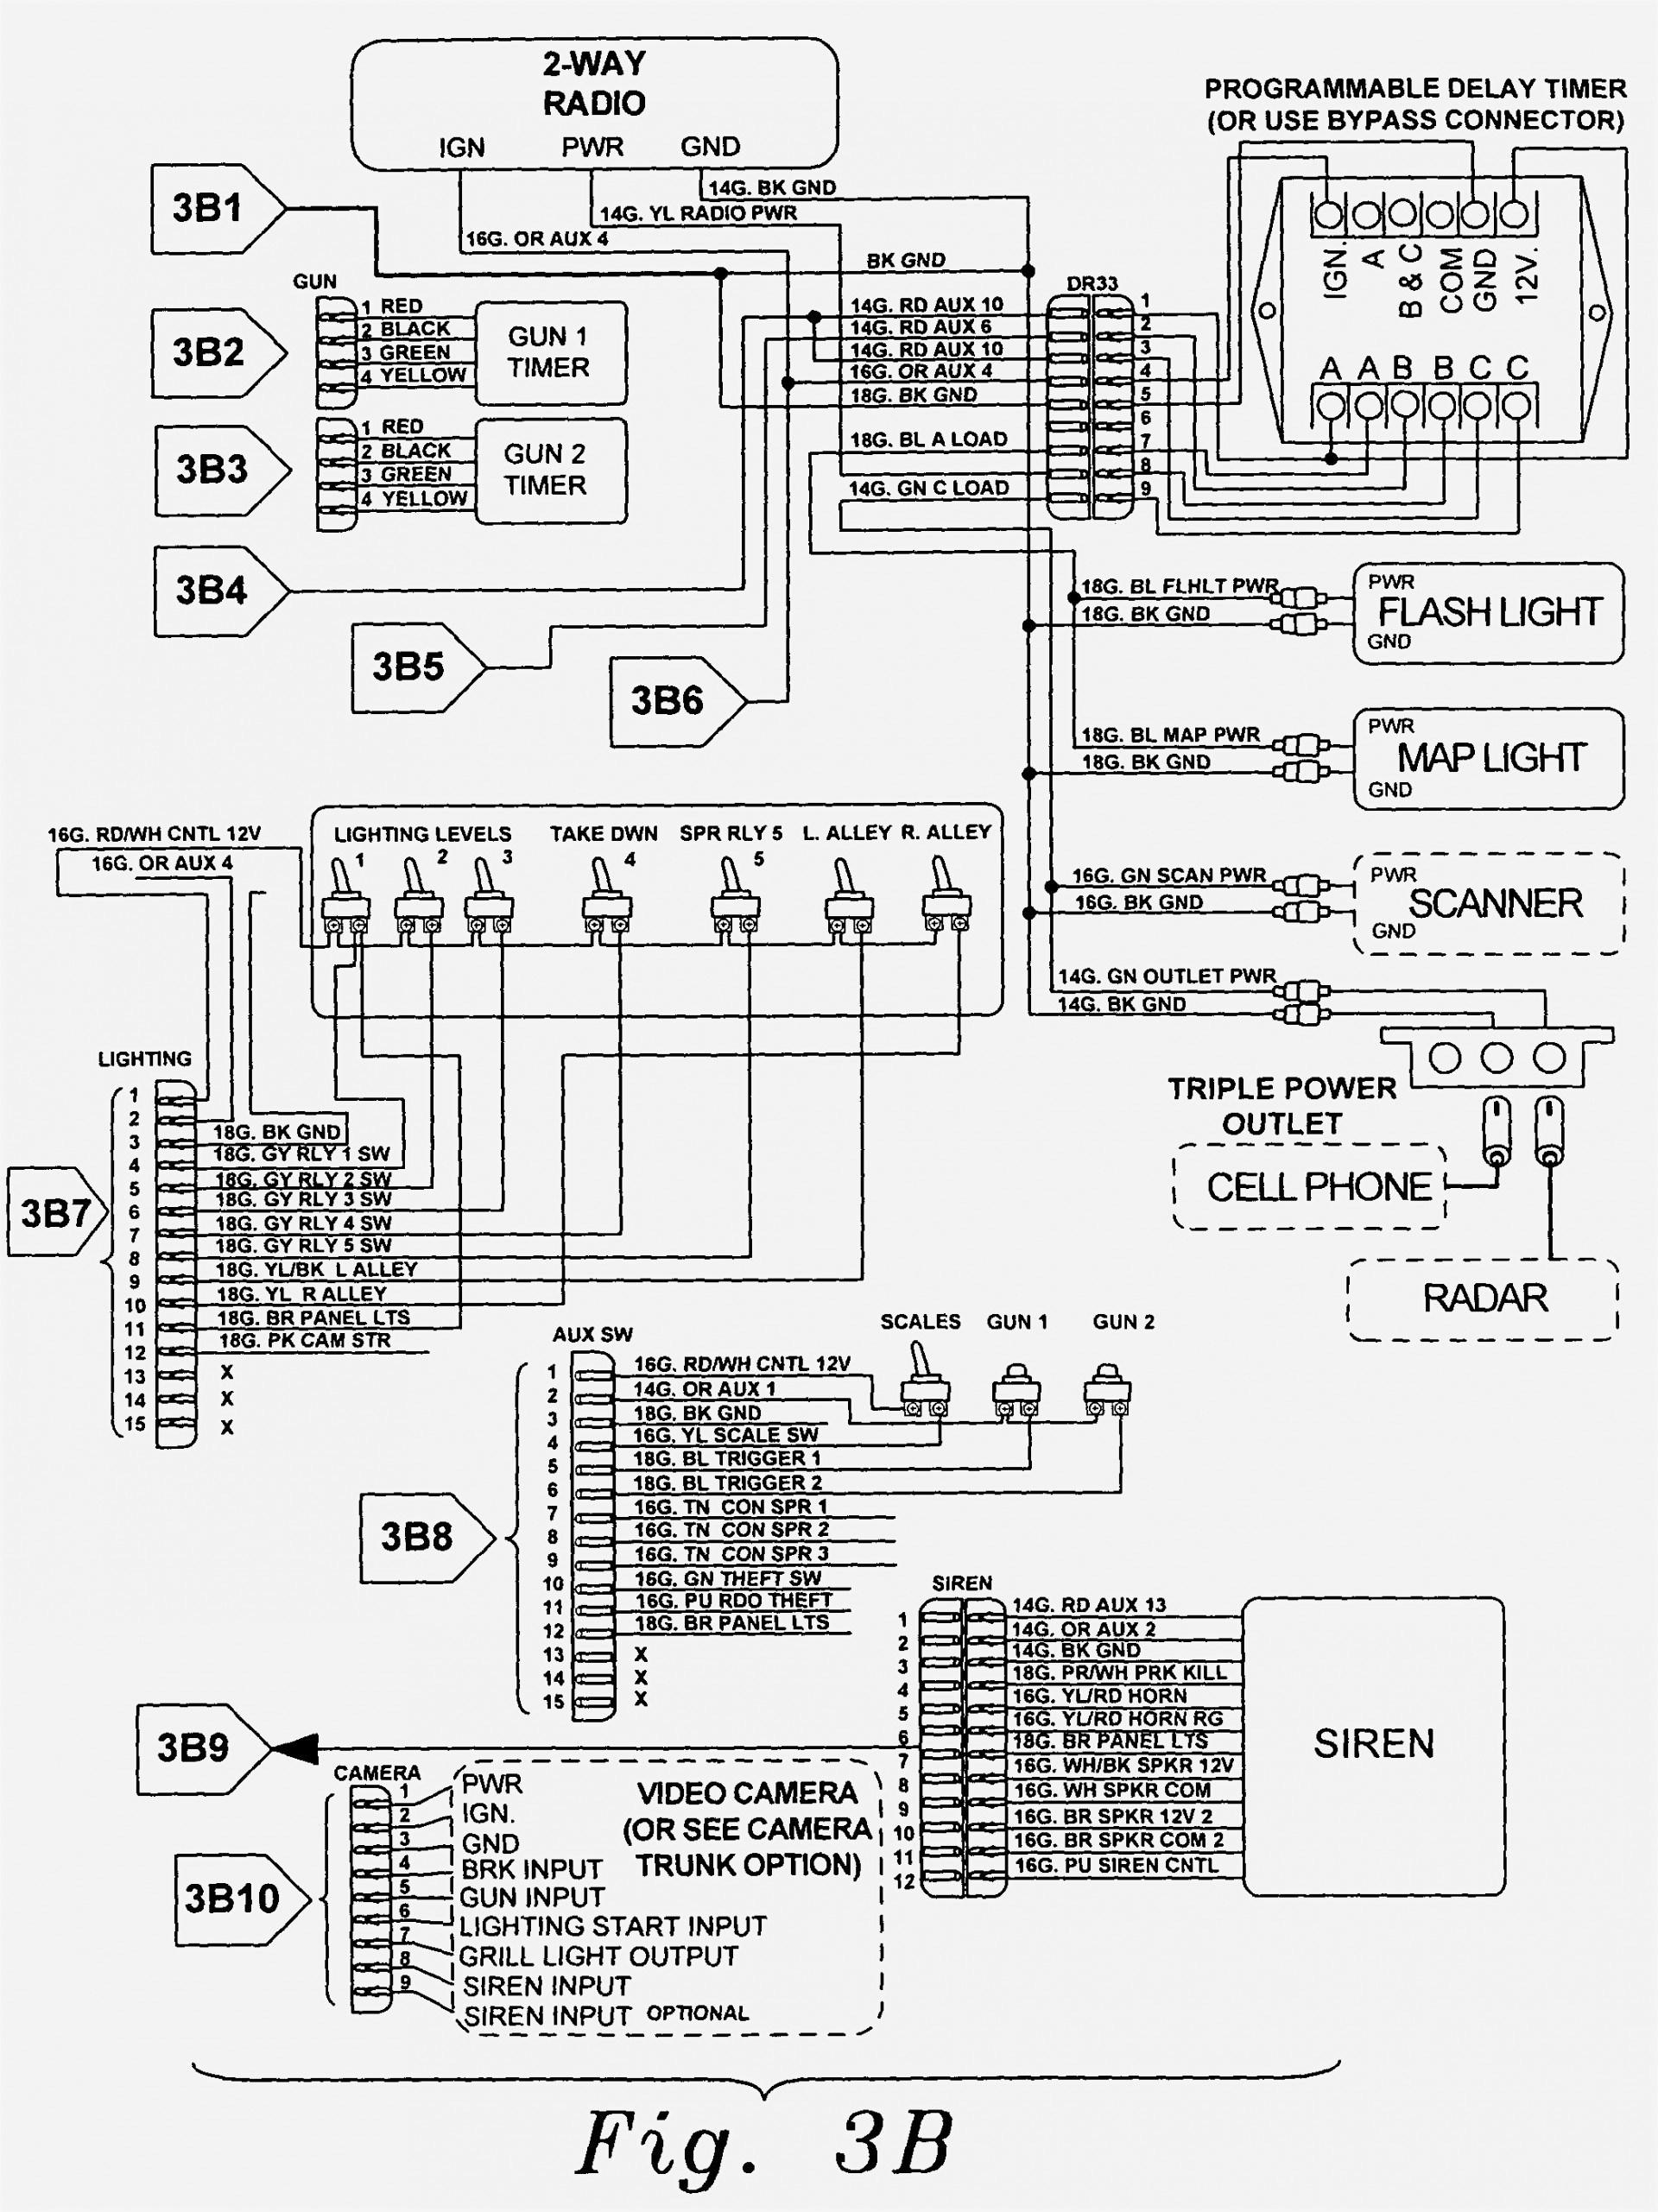 Whelen Justice Wiring Diagram - Wiring Diagrams Click - Whelen Light Bar Wiring Diagram